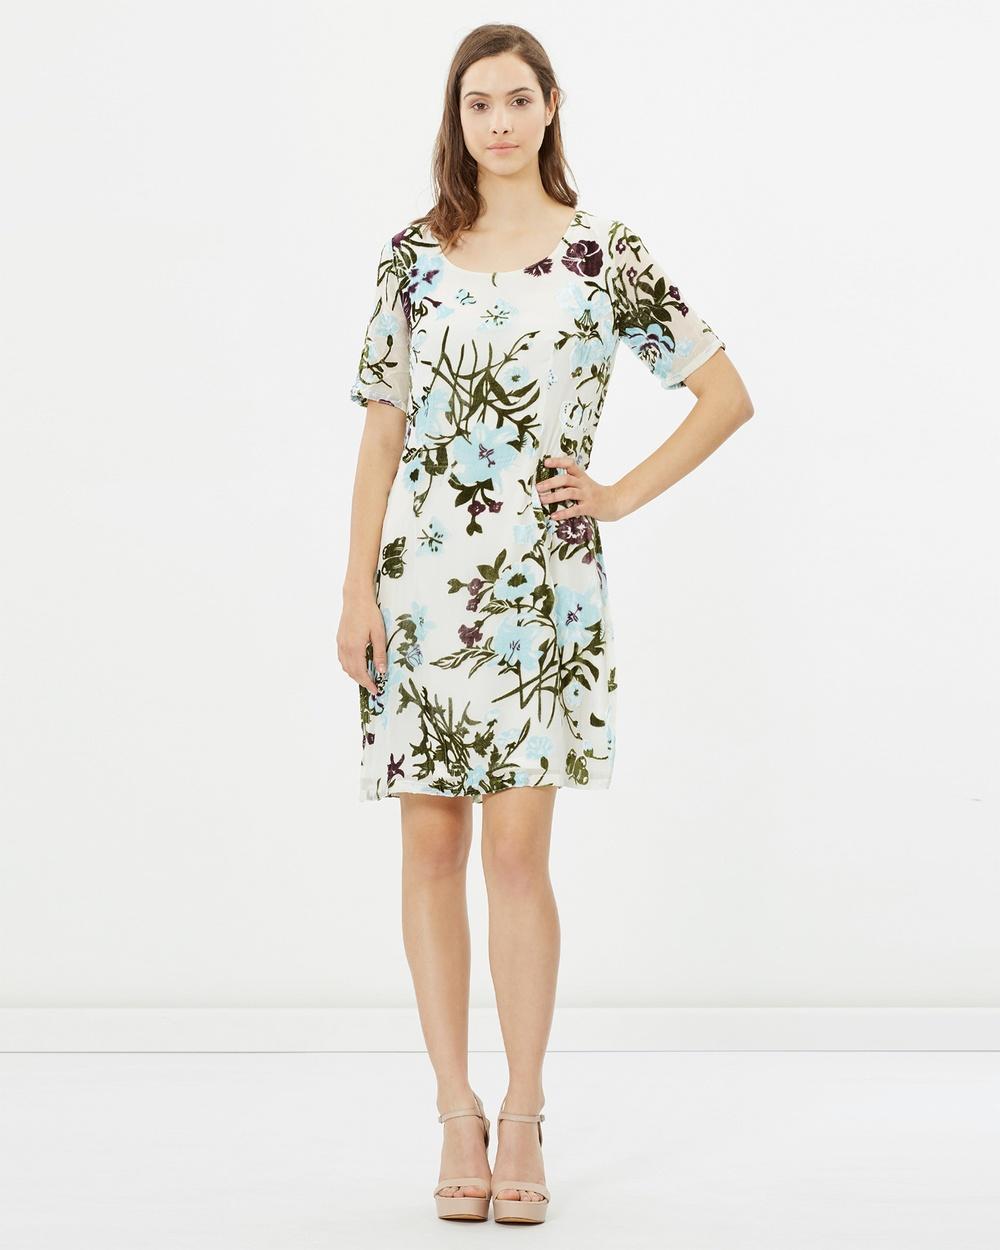 Faye Black Label Scoop Neck Dress Dresses Summer Blooms Scoop Neck Dress